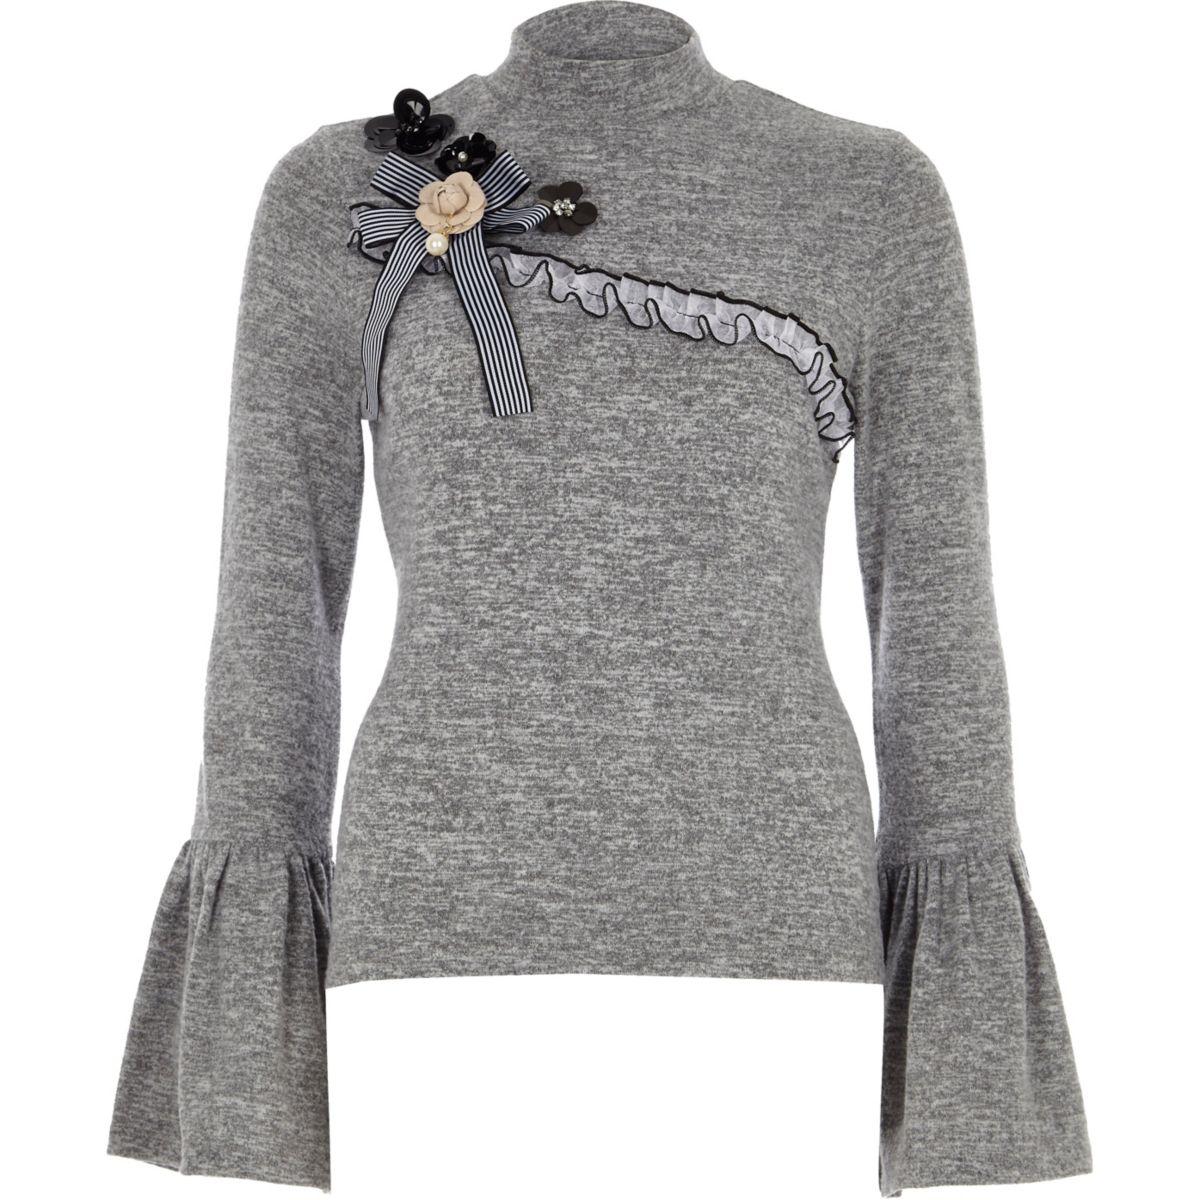 Grey high neck frill sleeve embellished top